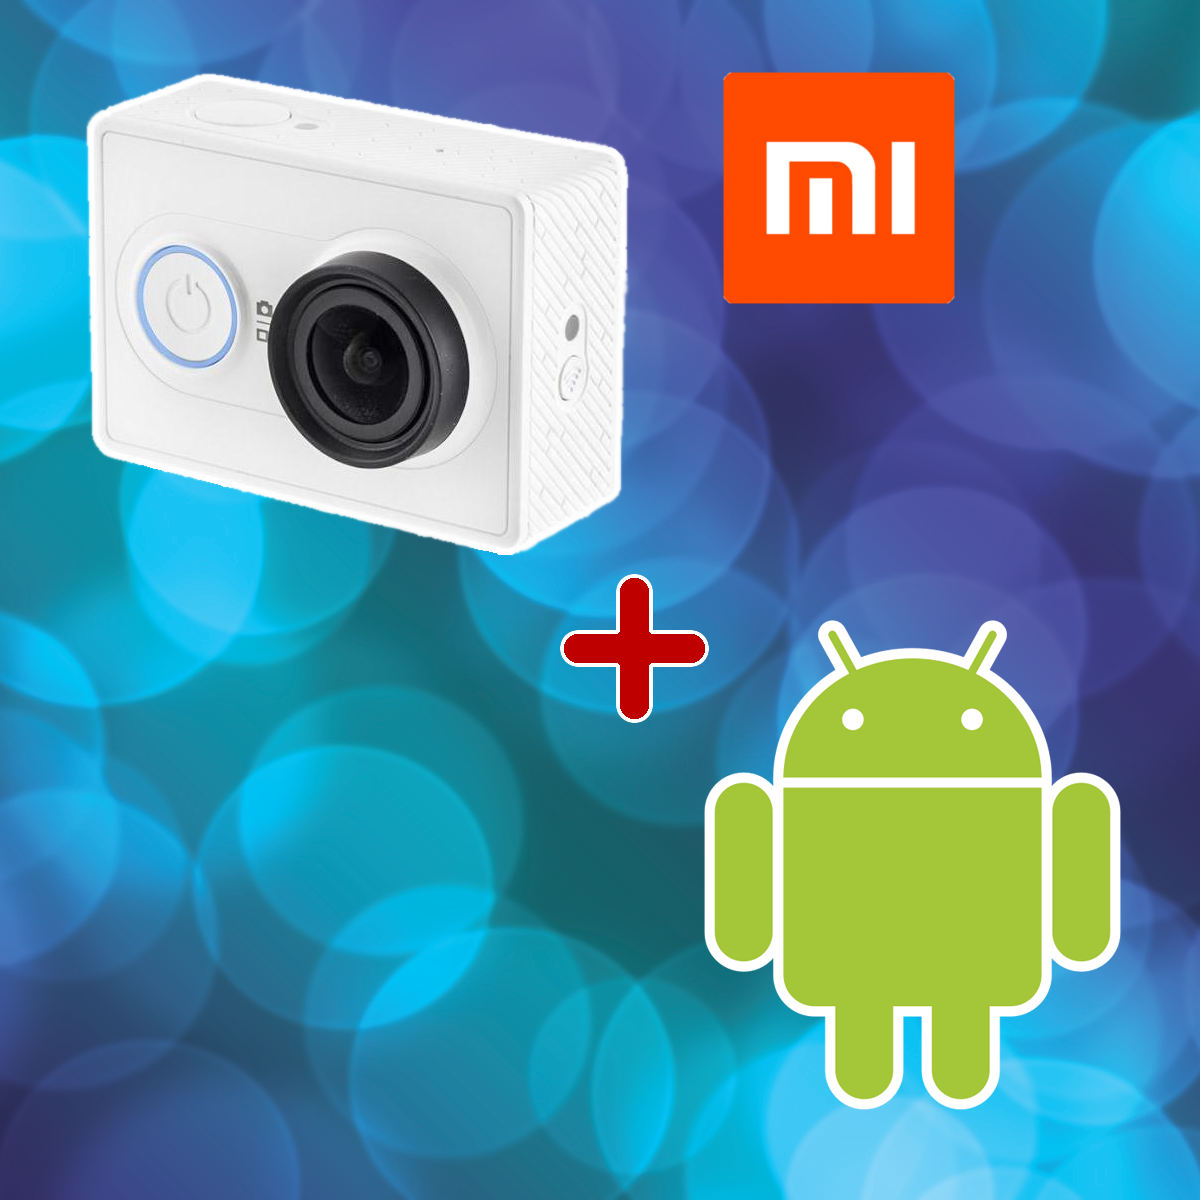 Android + kamery Xiaomi YI